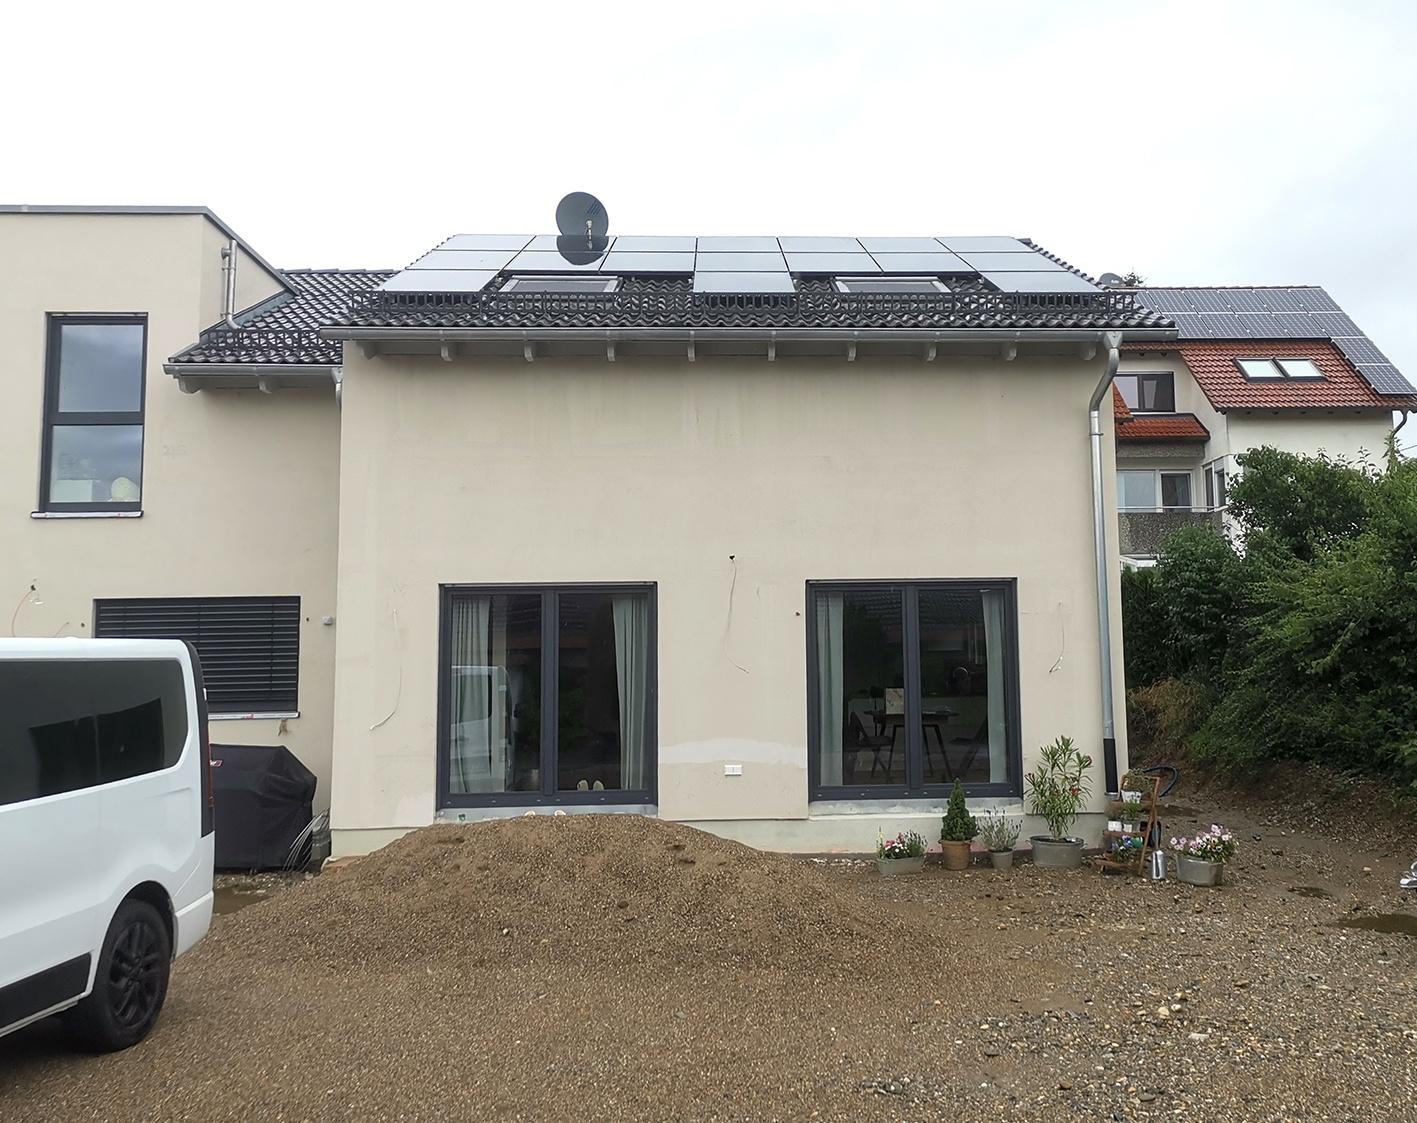 Referenz e.systeme21 | Privatkunde, Dornstadt